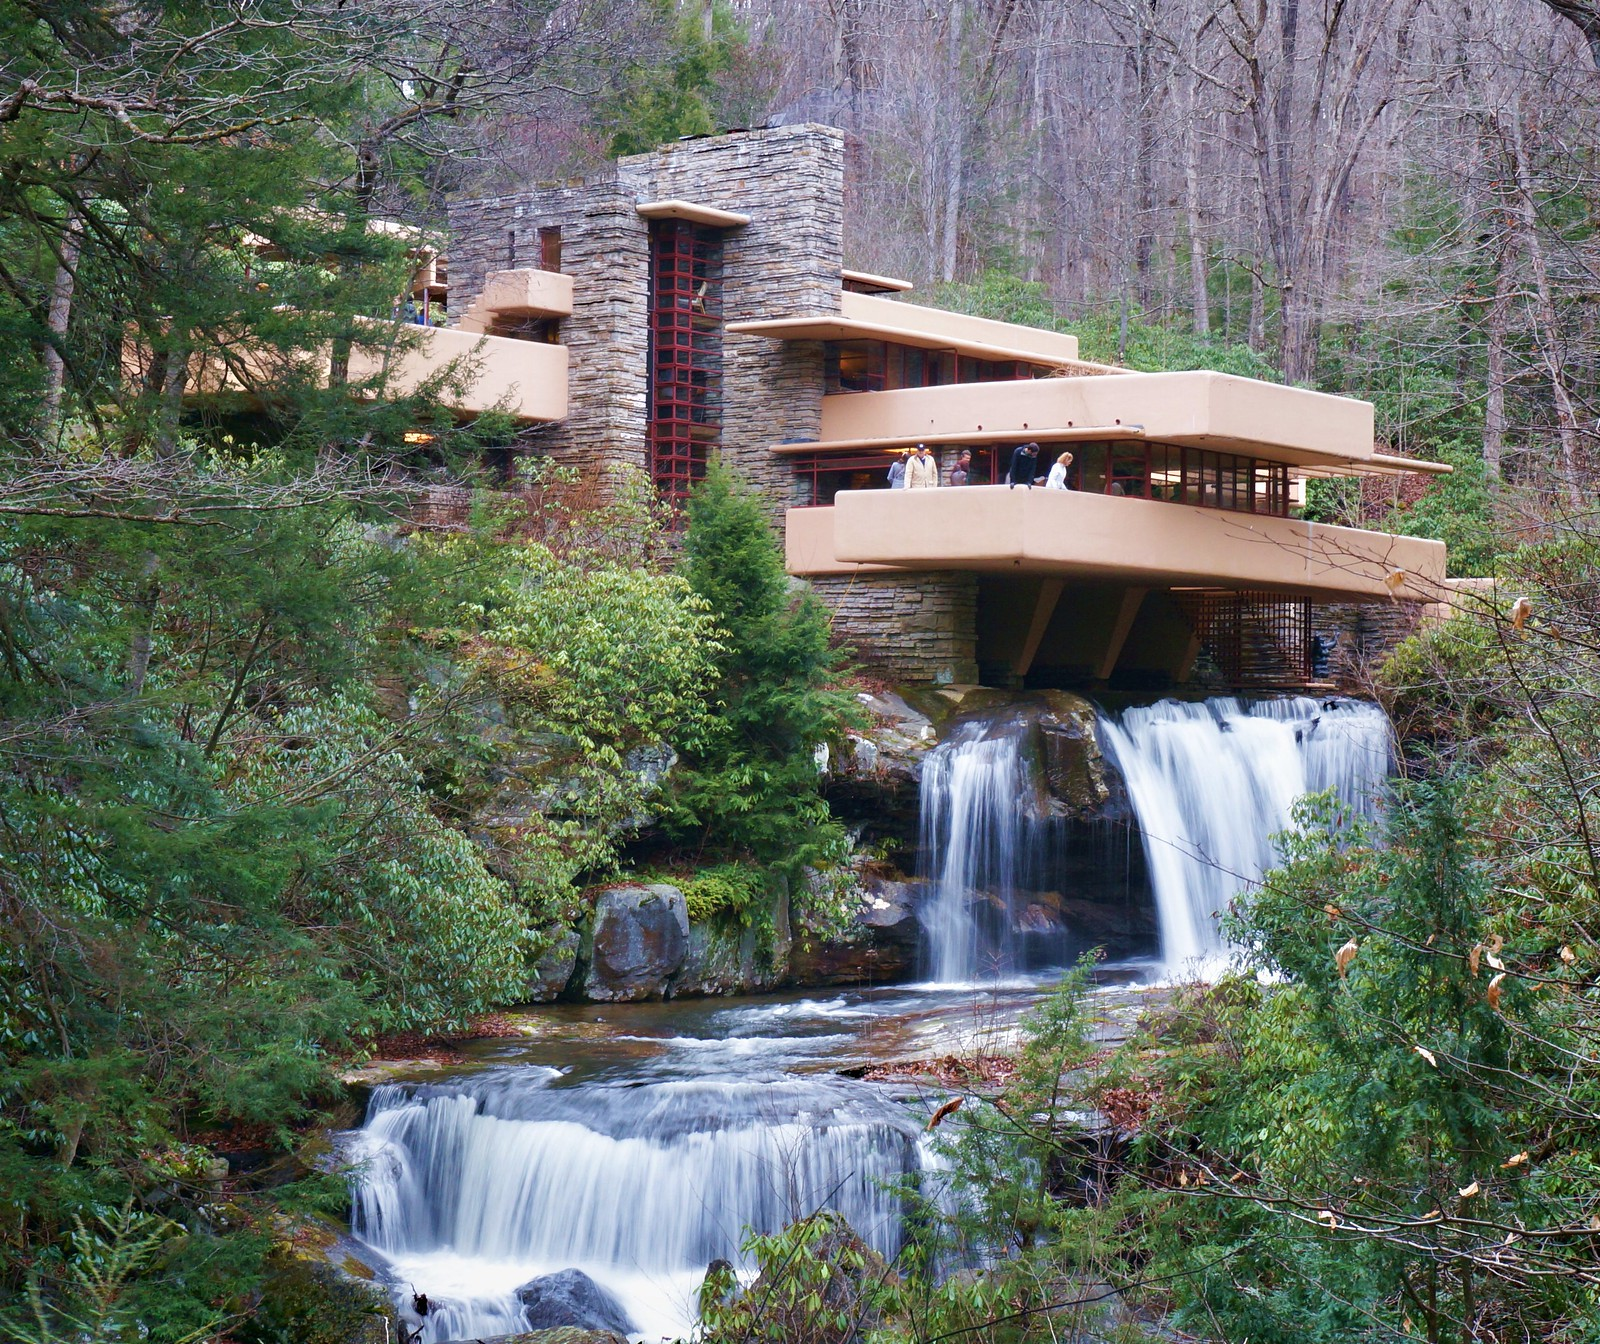 Fallingwater house, Pennsylvania [1600x1344]